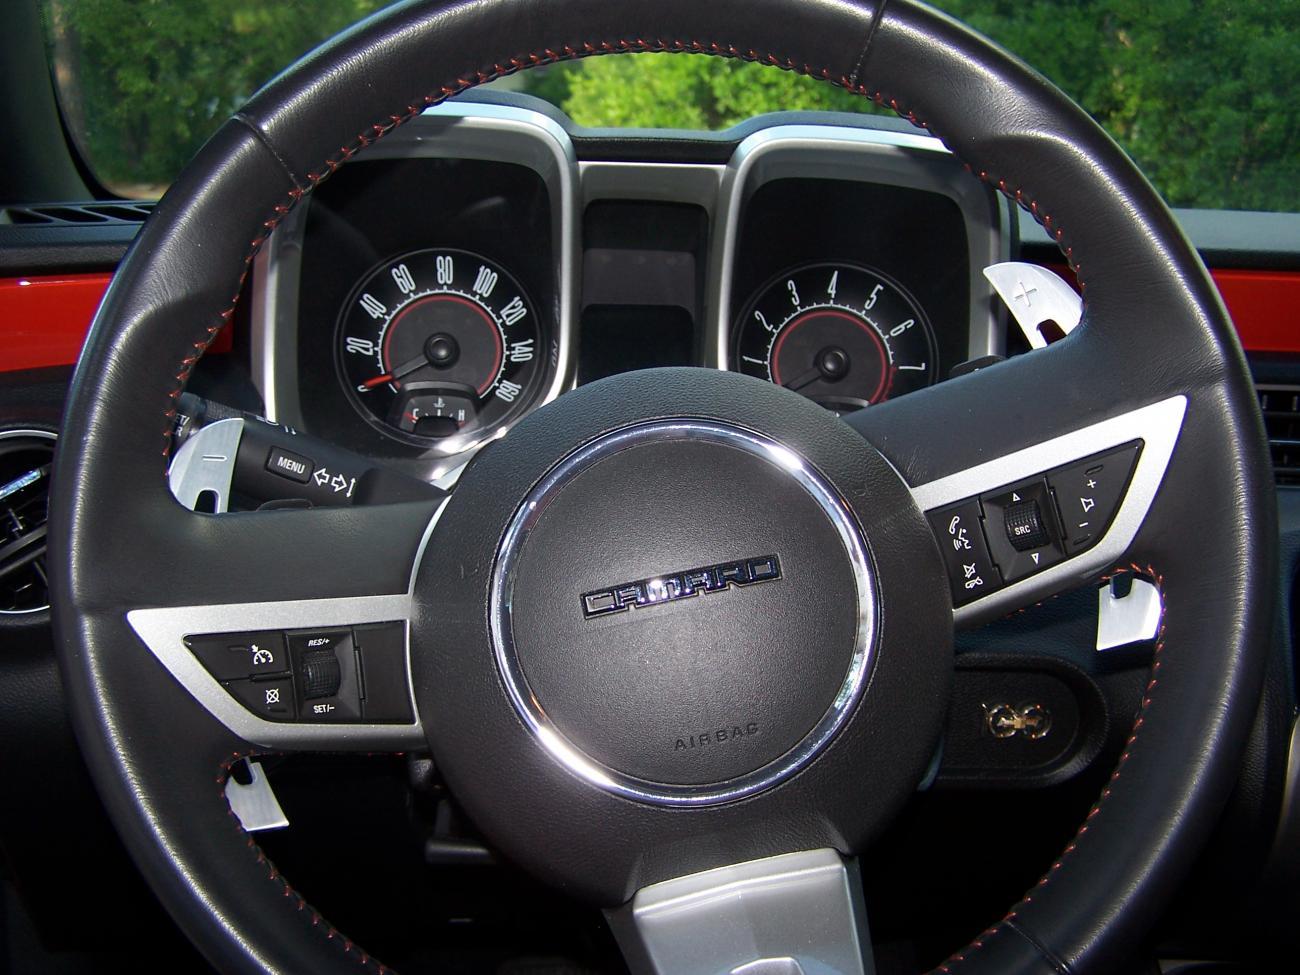 bowtie on the steering wheel help camaro5 chevy camaro. Black Bedroom Furniture Sets. Home Design Ideas